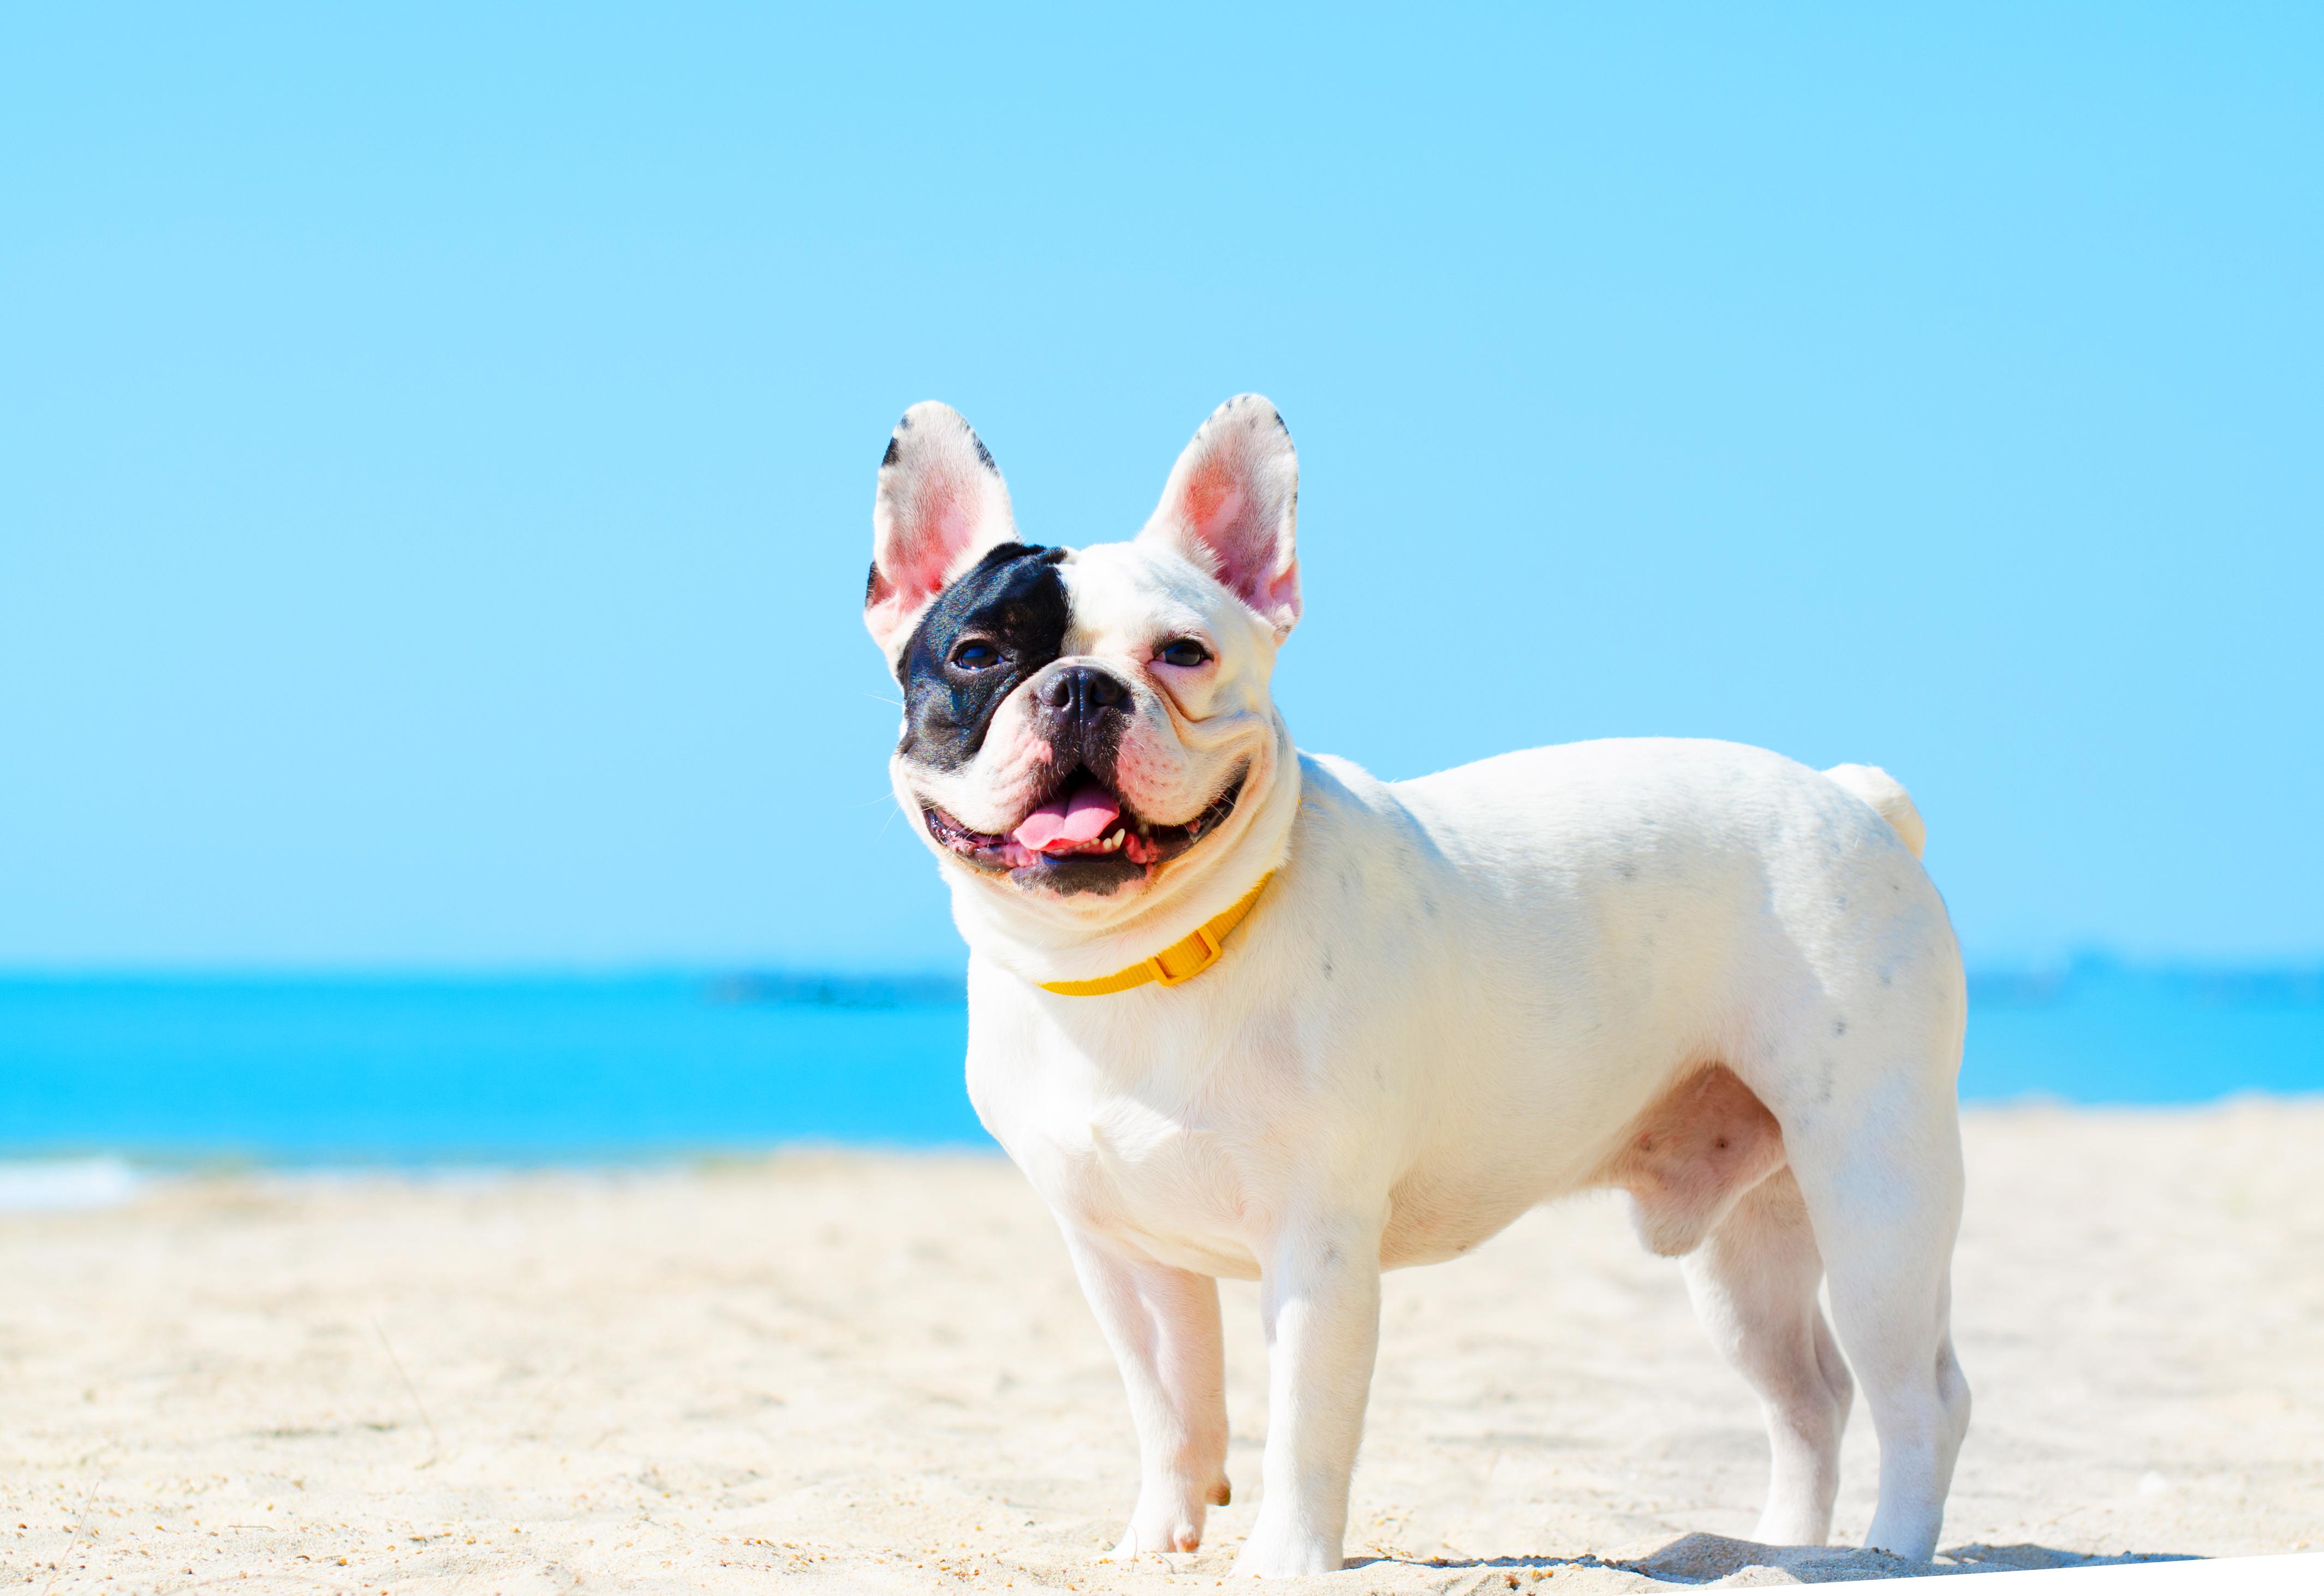 bulldog cachorro praia calor